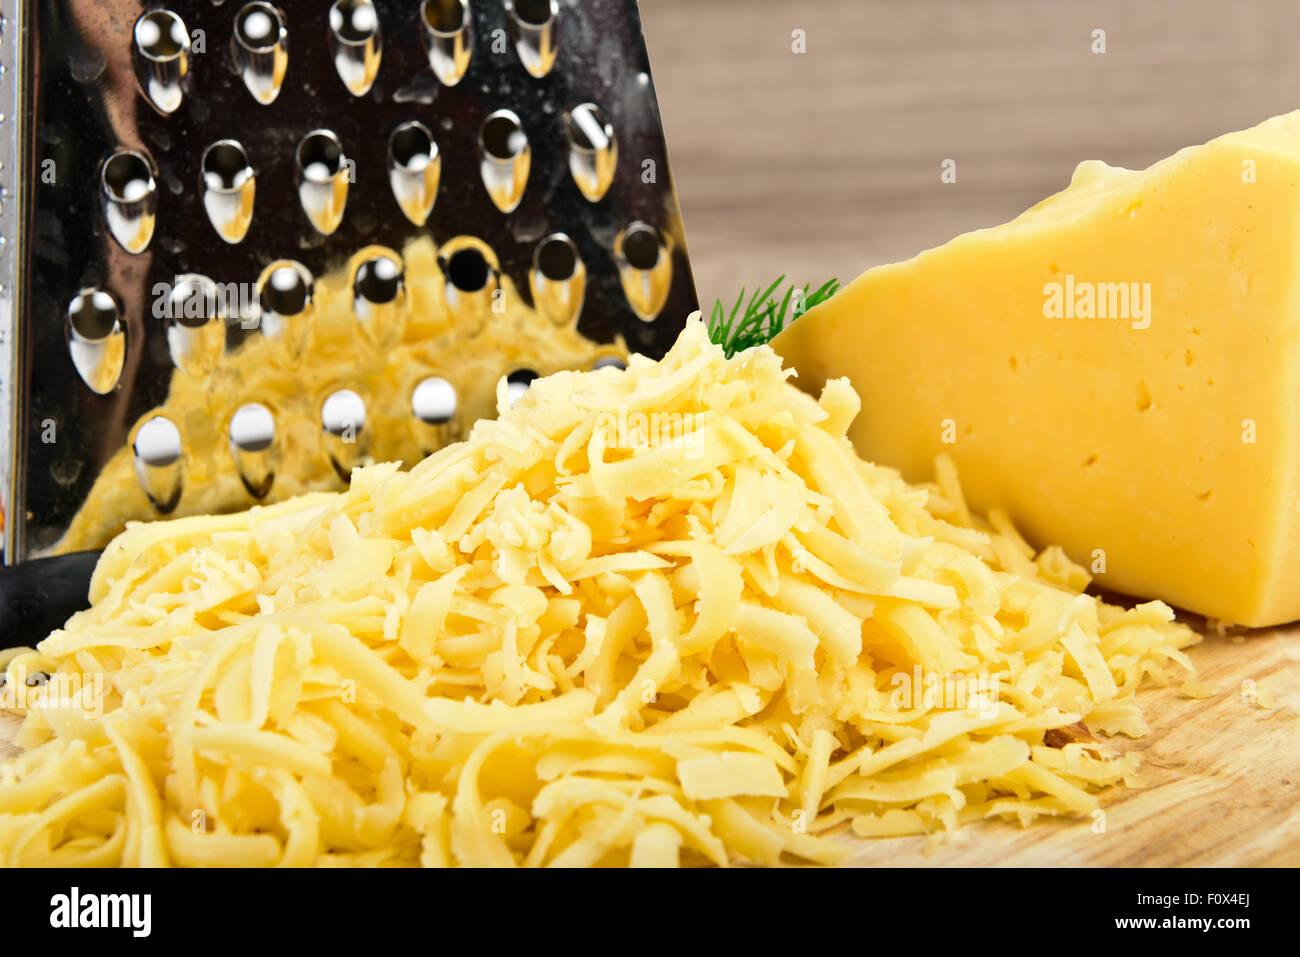 geriebenen Käse auf Holzbrett Stockfoto, Bild: 86626138 - Alamy